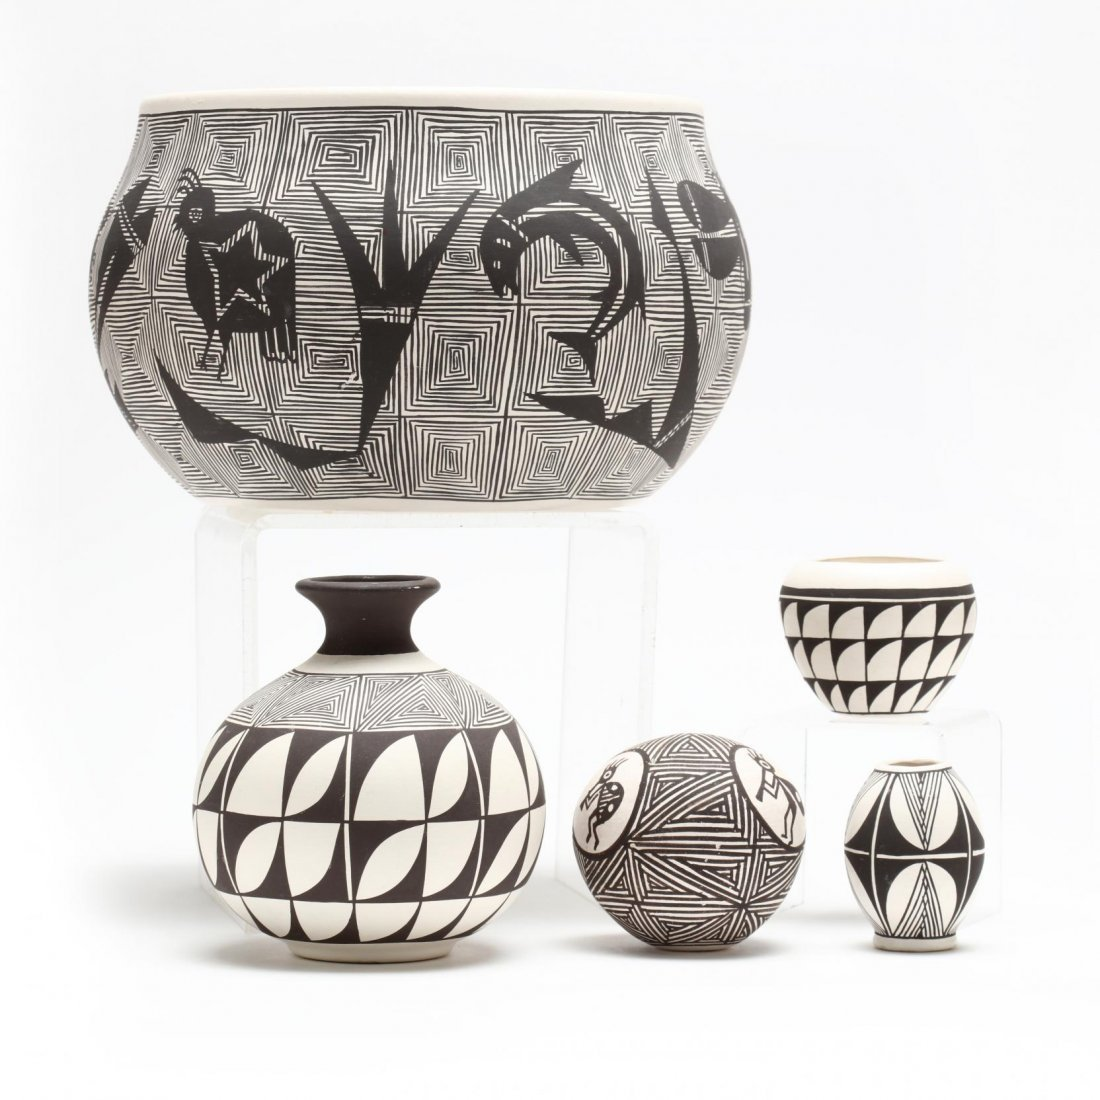 Five Acoma Pottery Objects